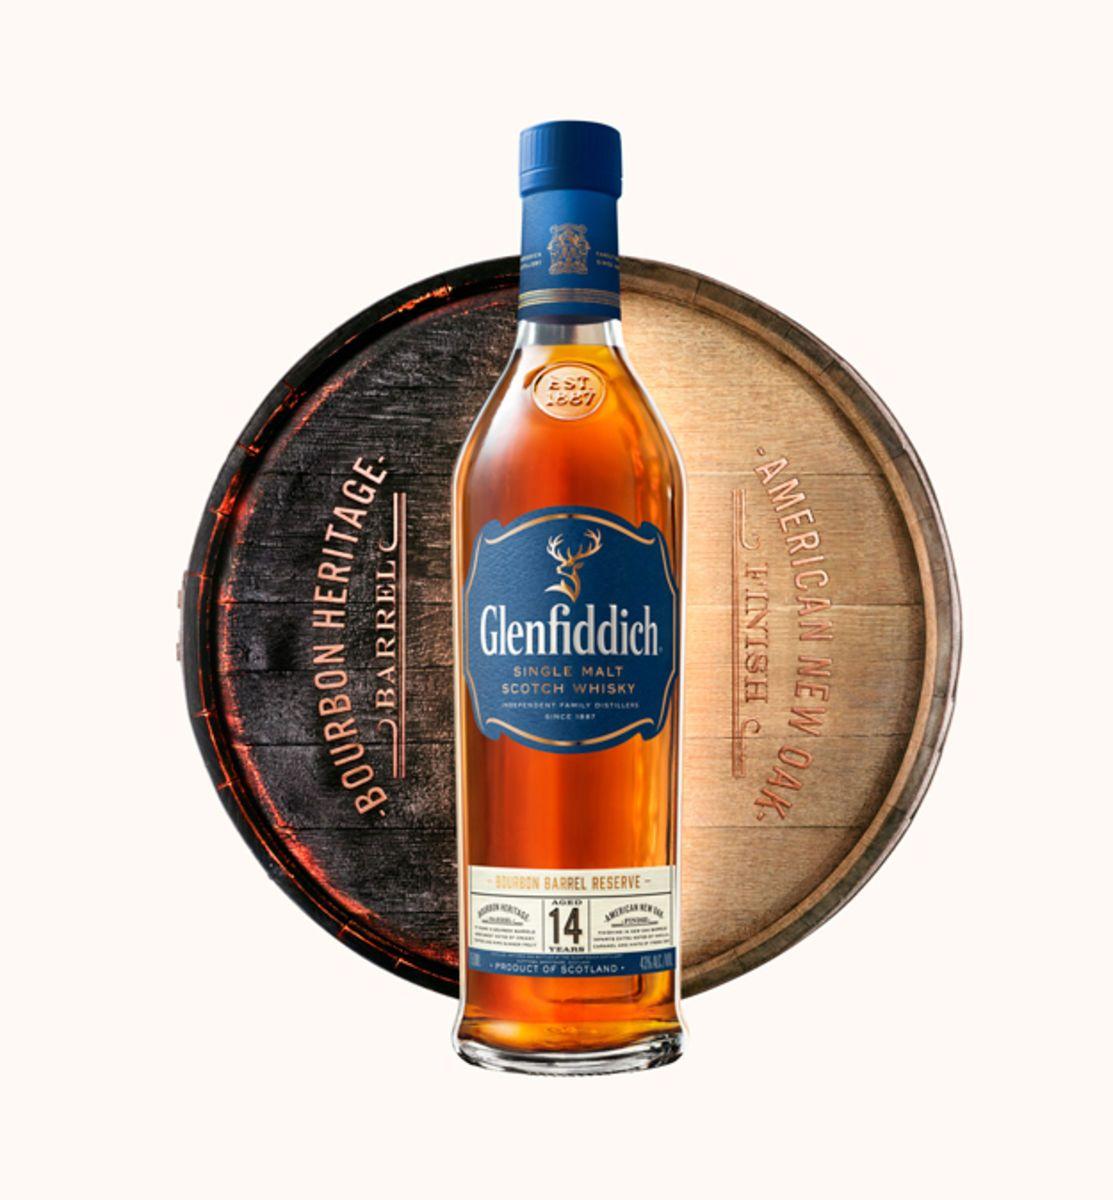 Glenfiddich's latest scotch gets a Kentucky kick - Acquire